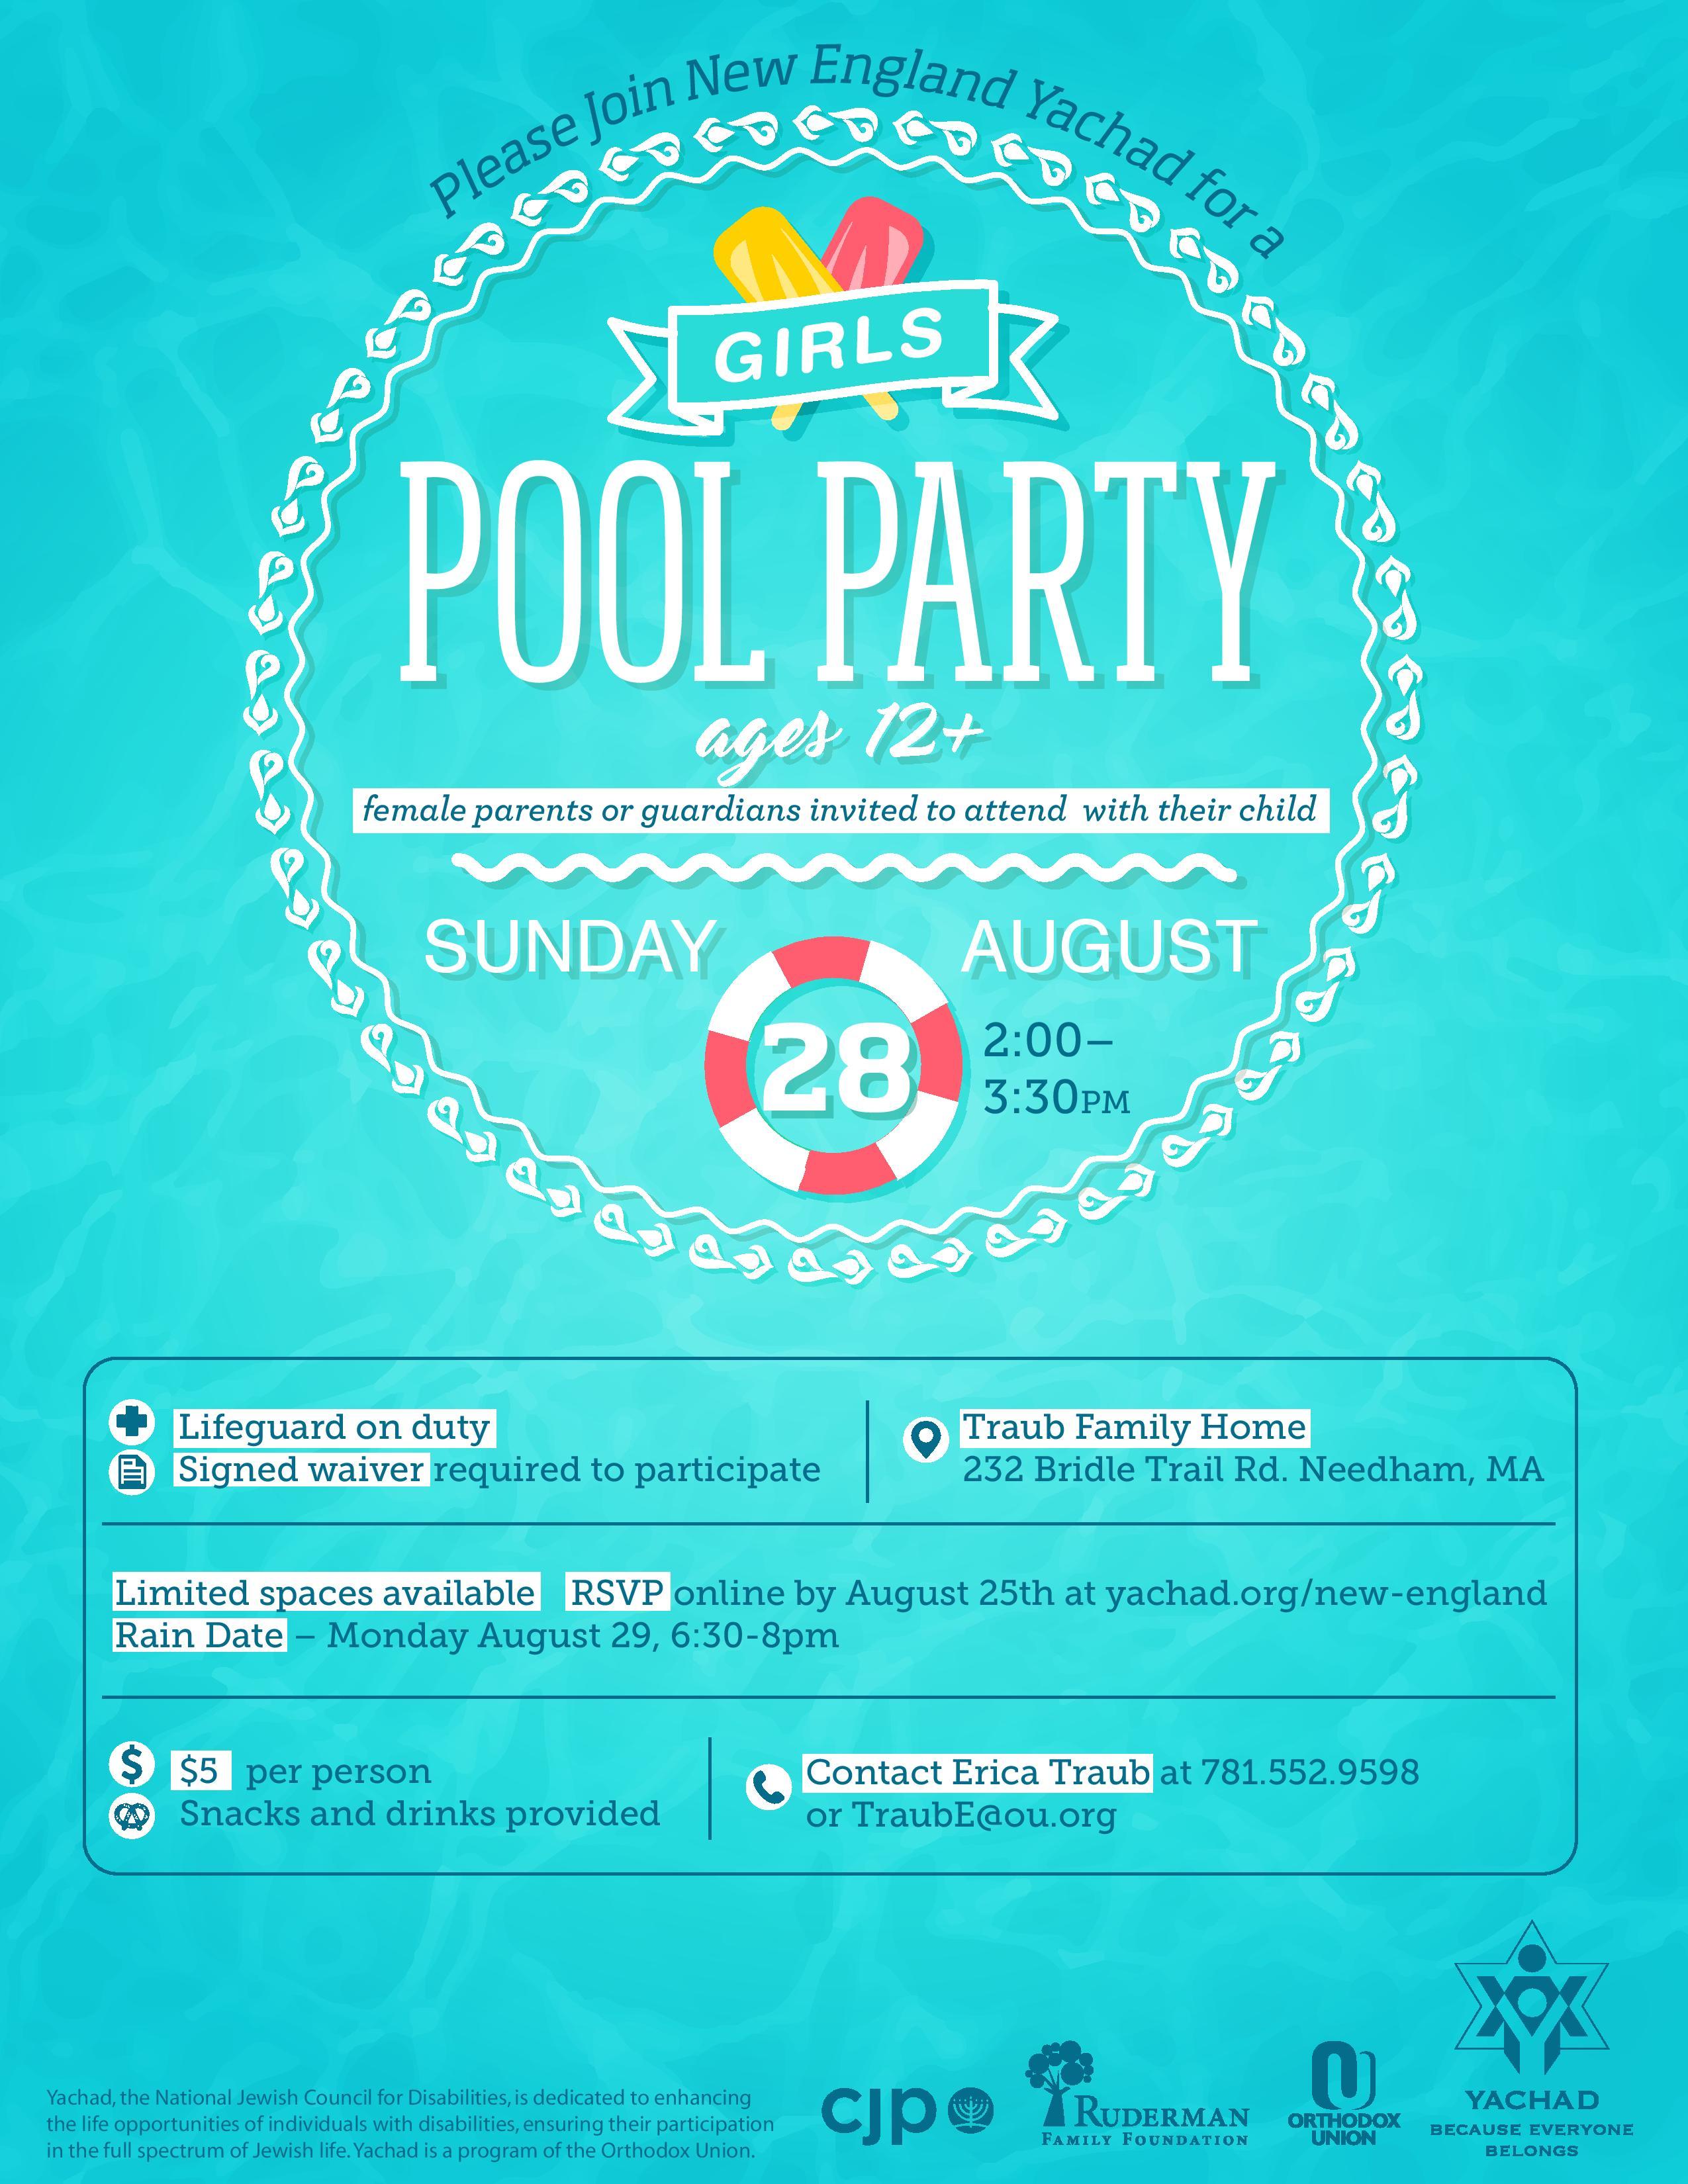 Girls Summer Pool Party Yachad